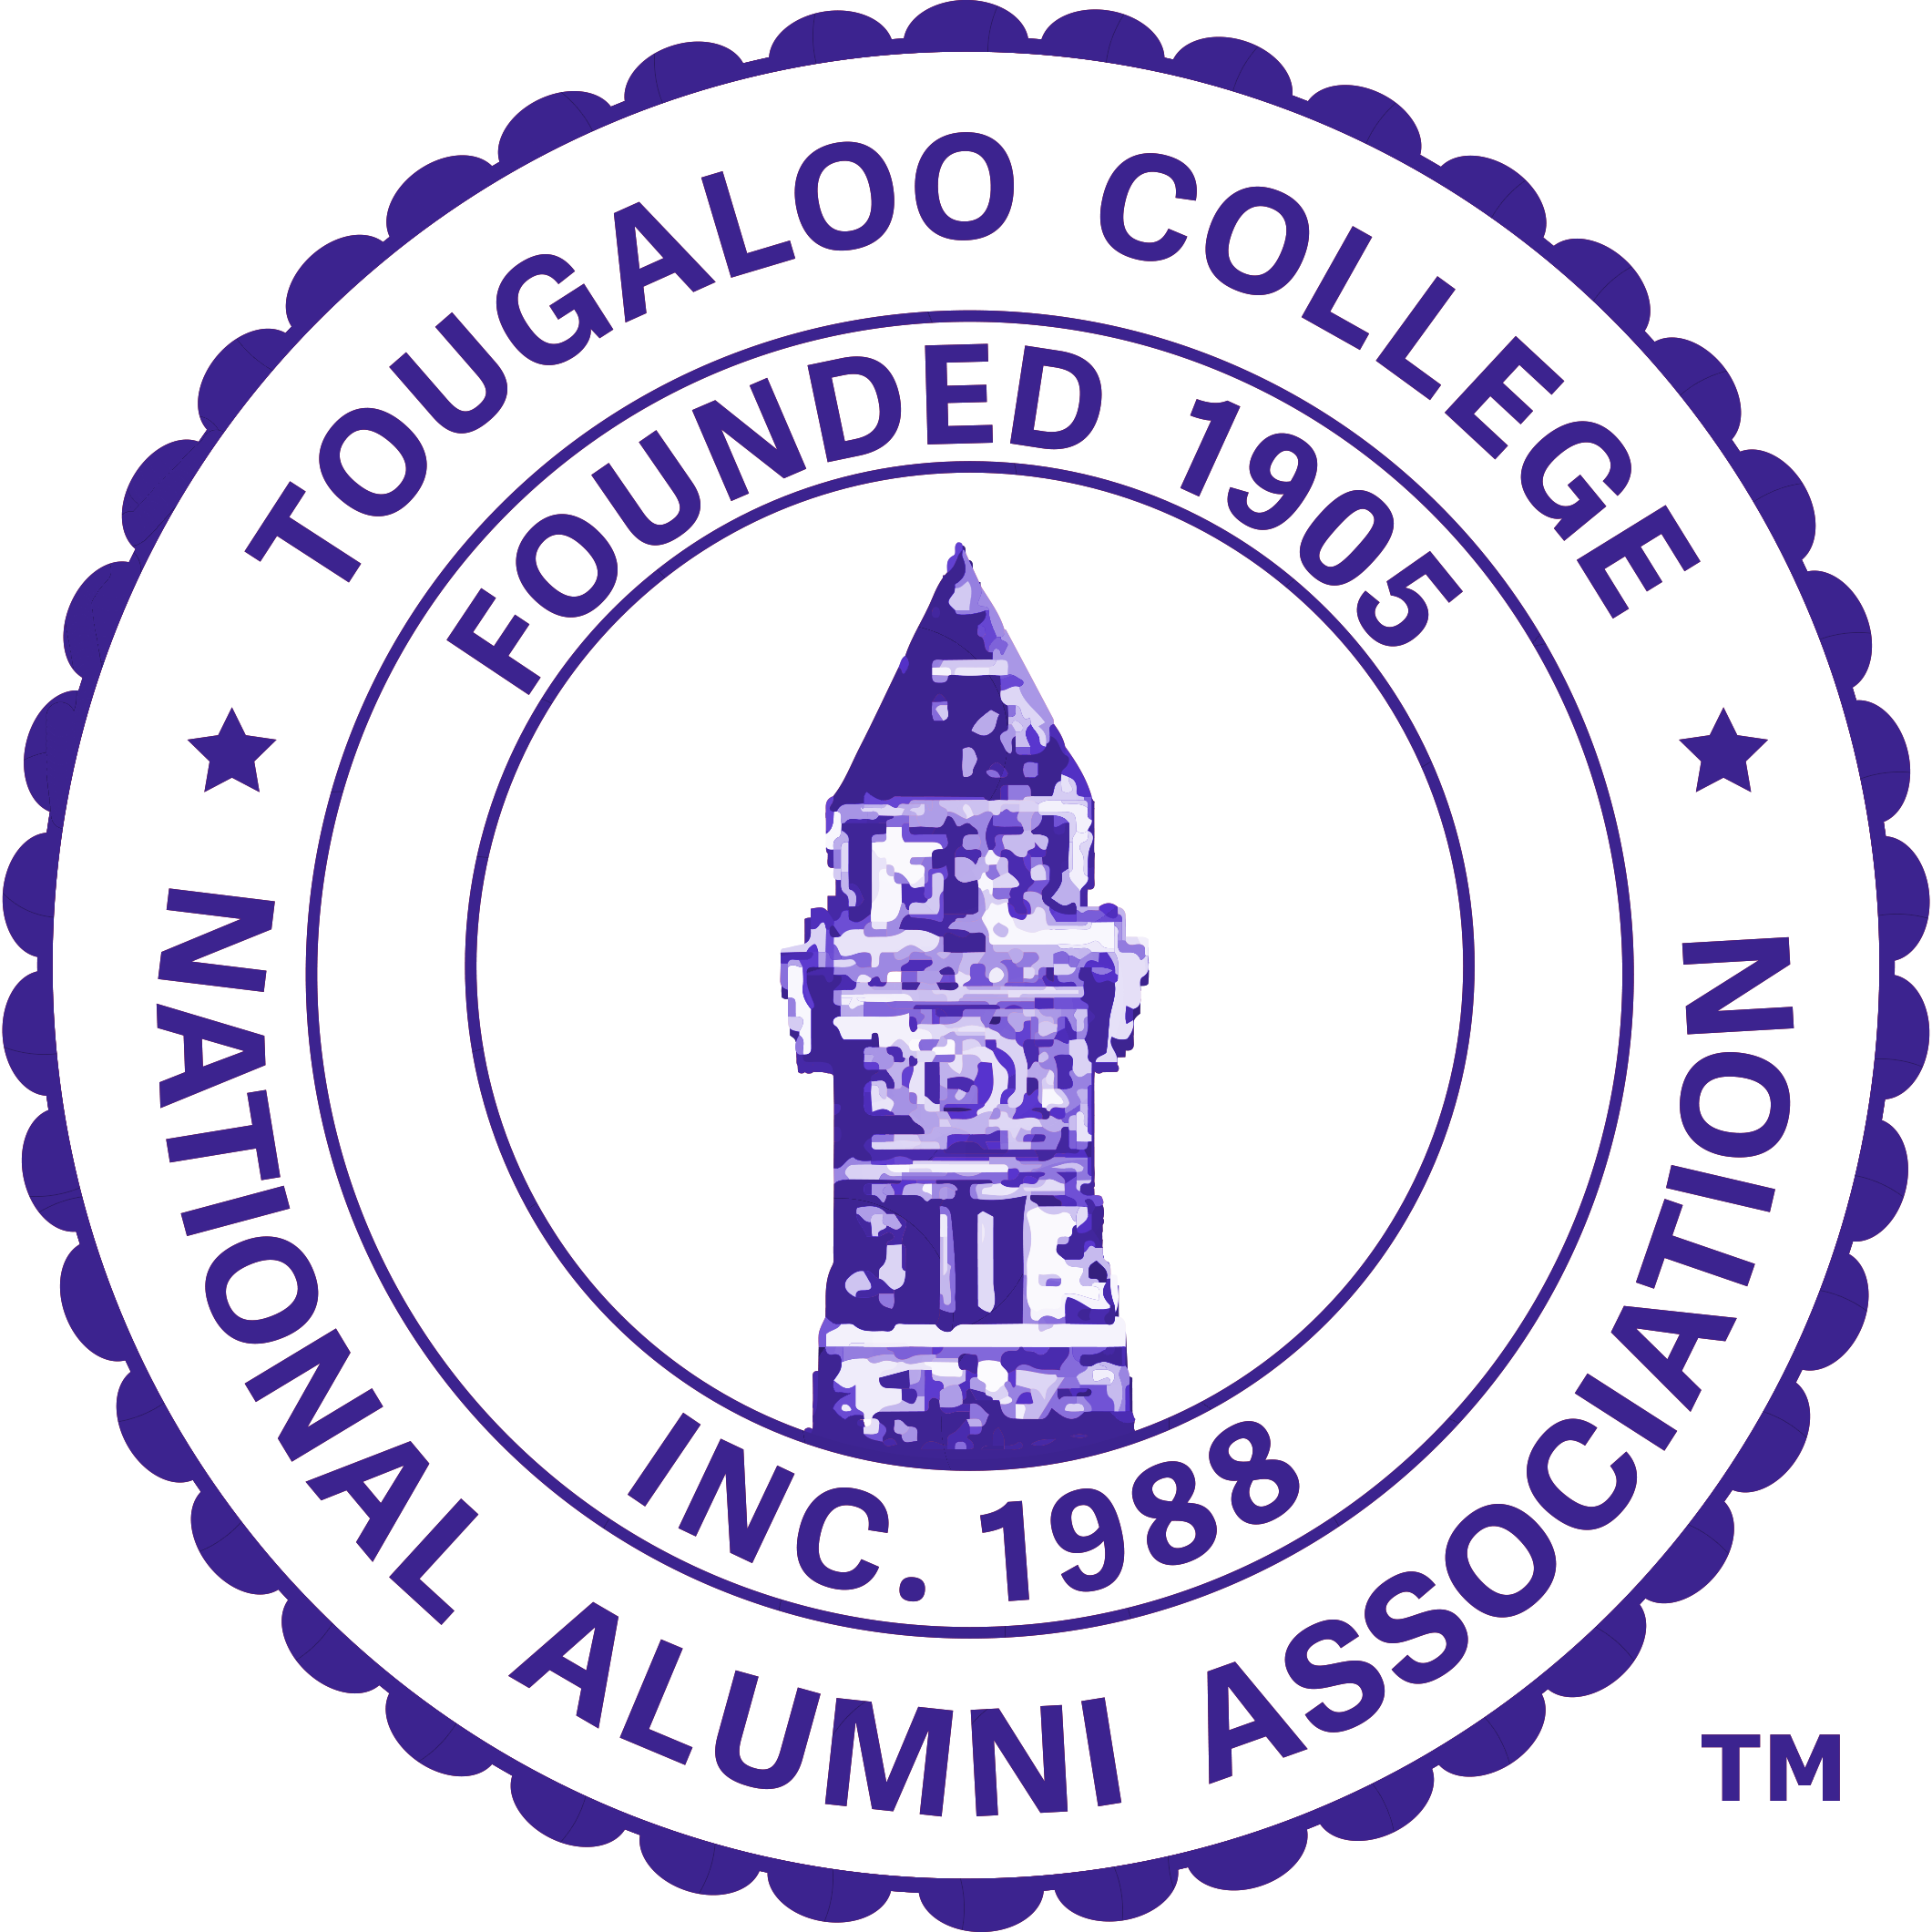 Tougaloo College National Alumni Association